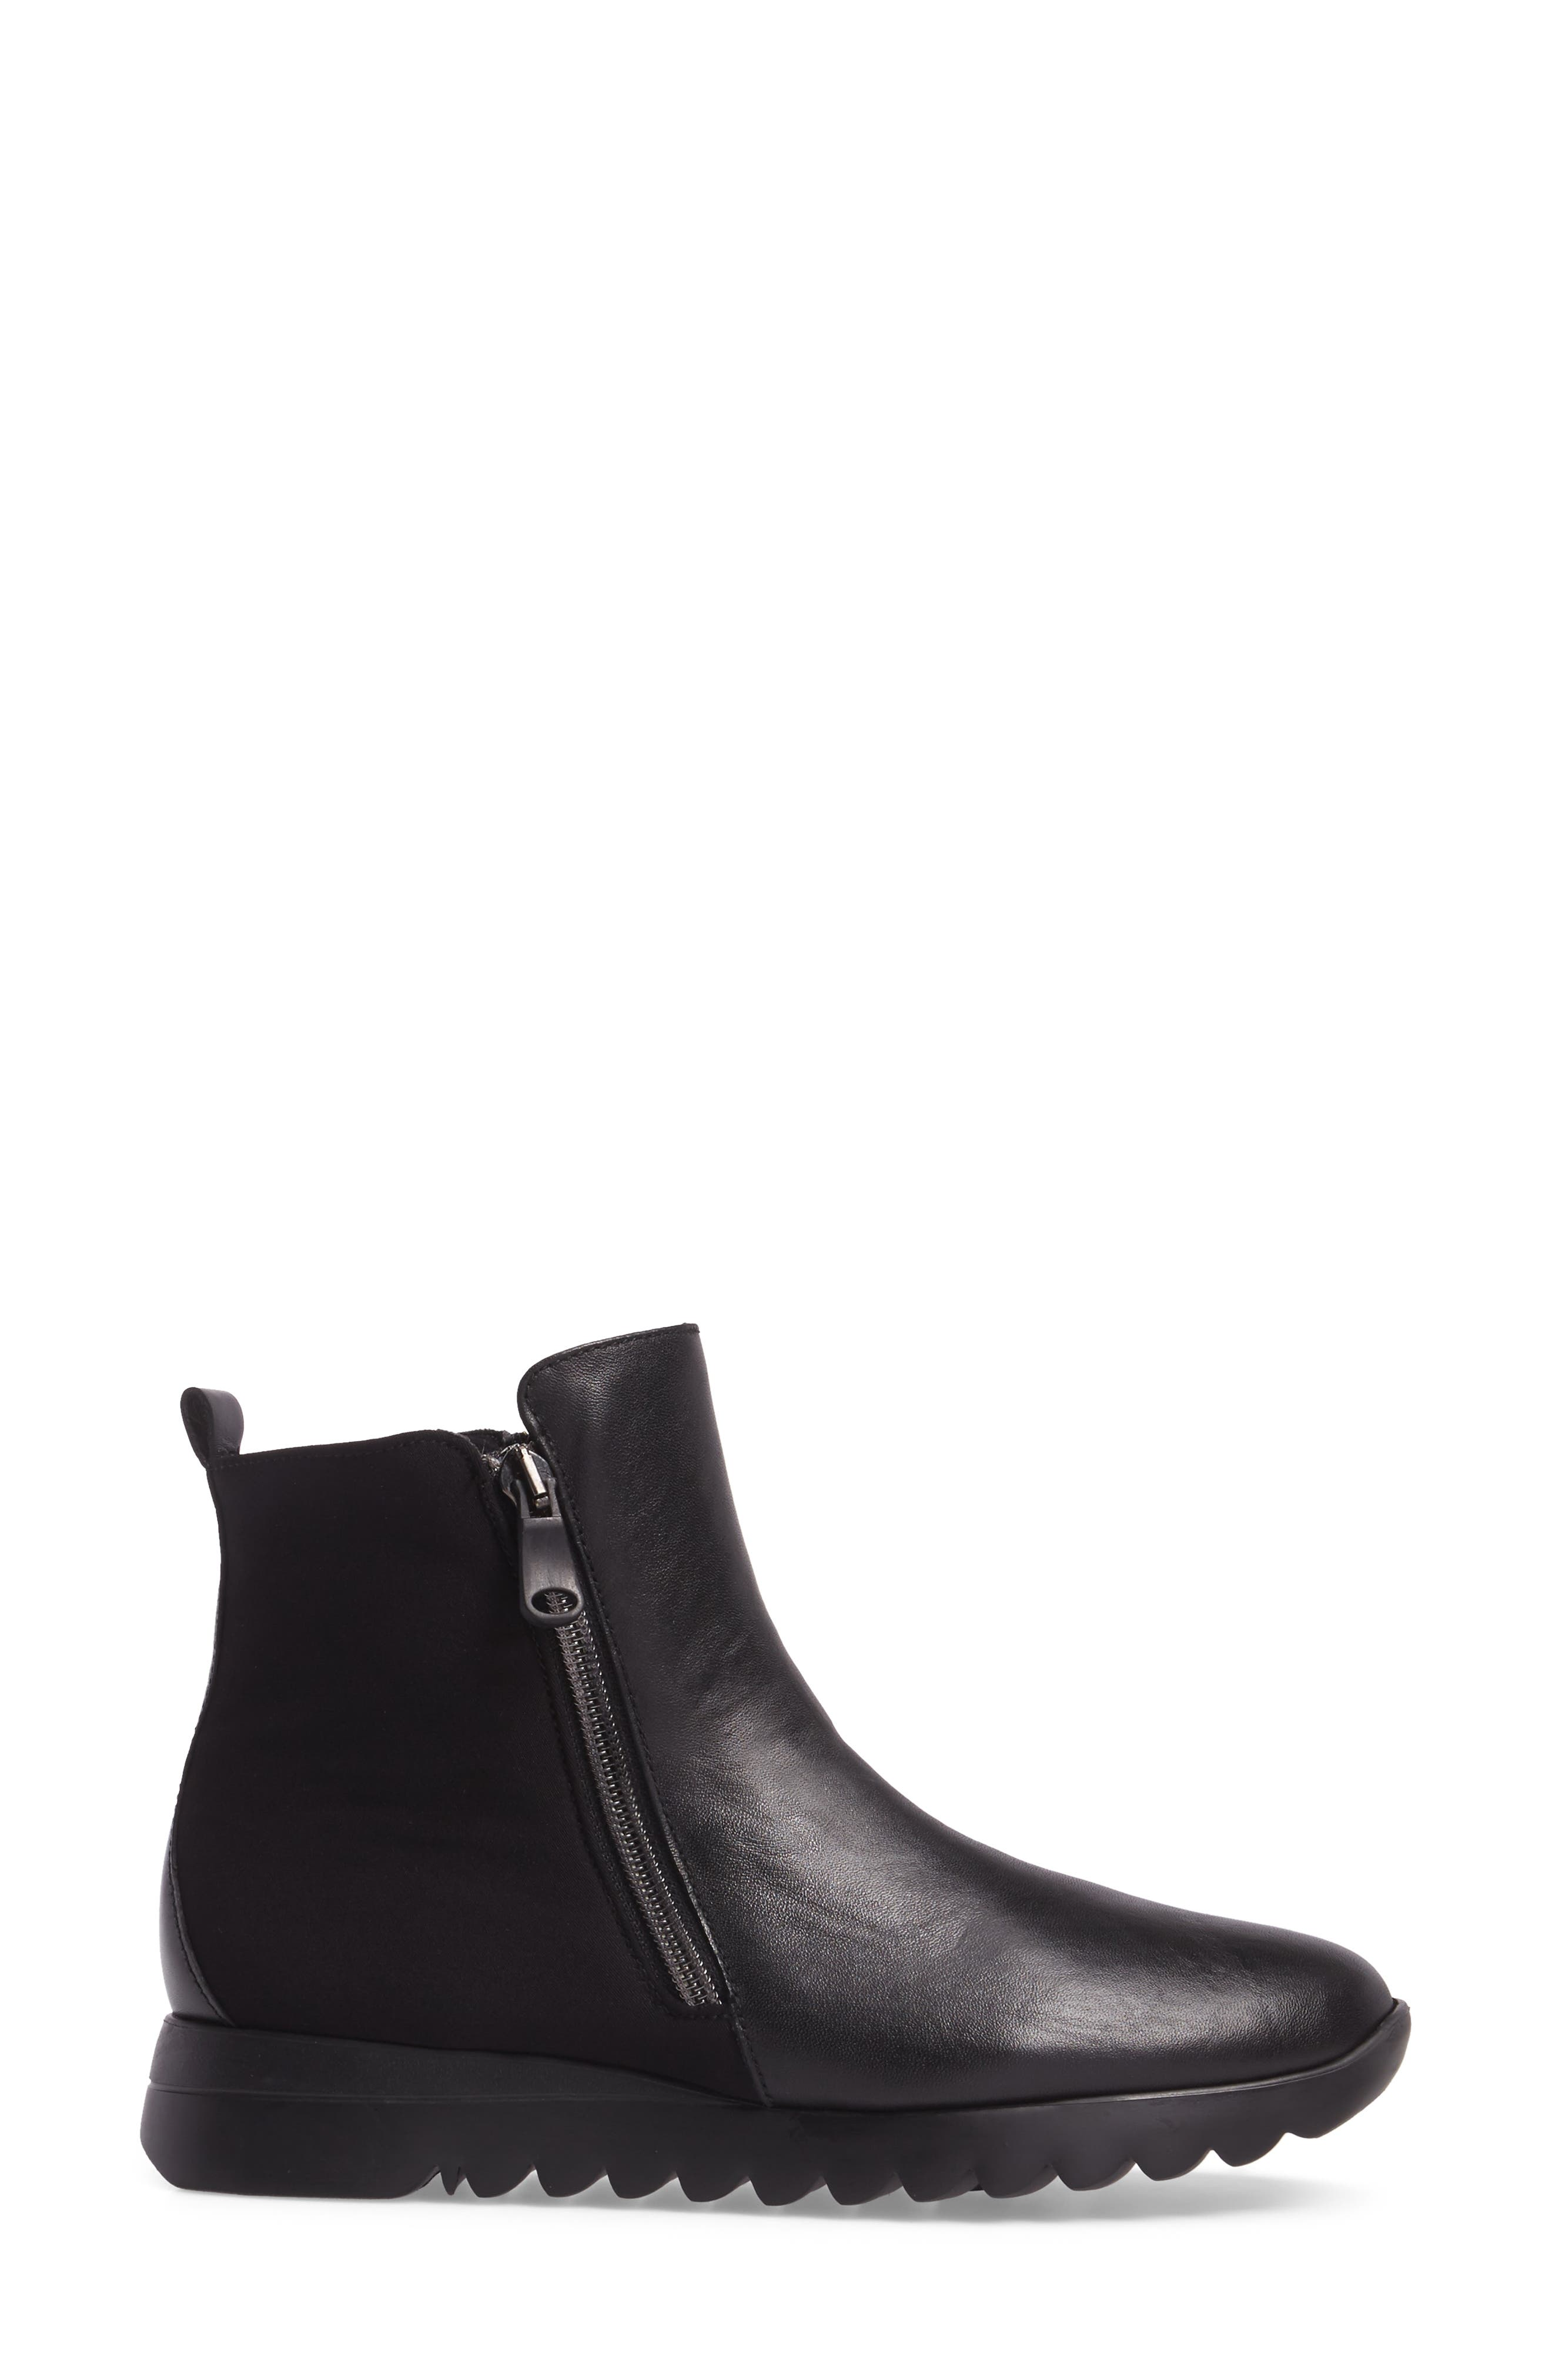 Ashcroft Bootie,                             Alternate thumbnail 3, color,                             Black Leather